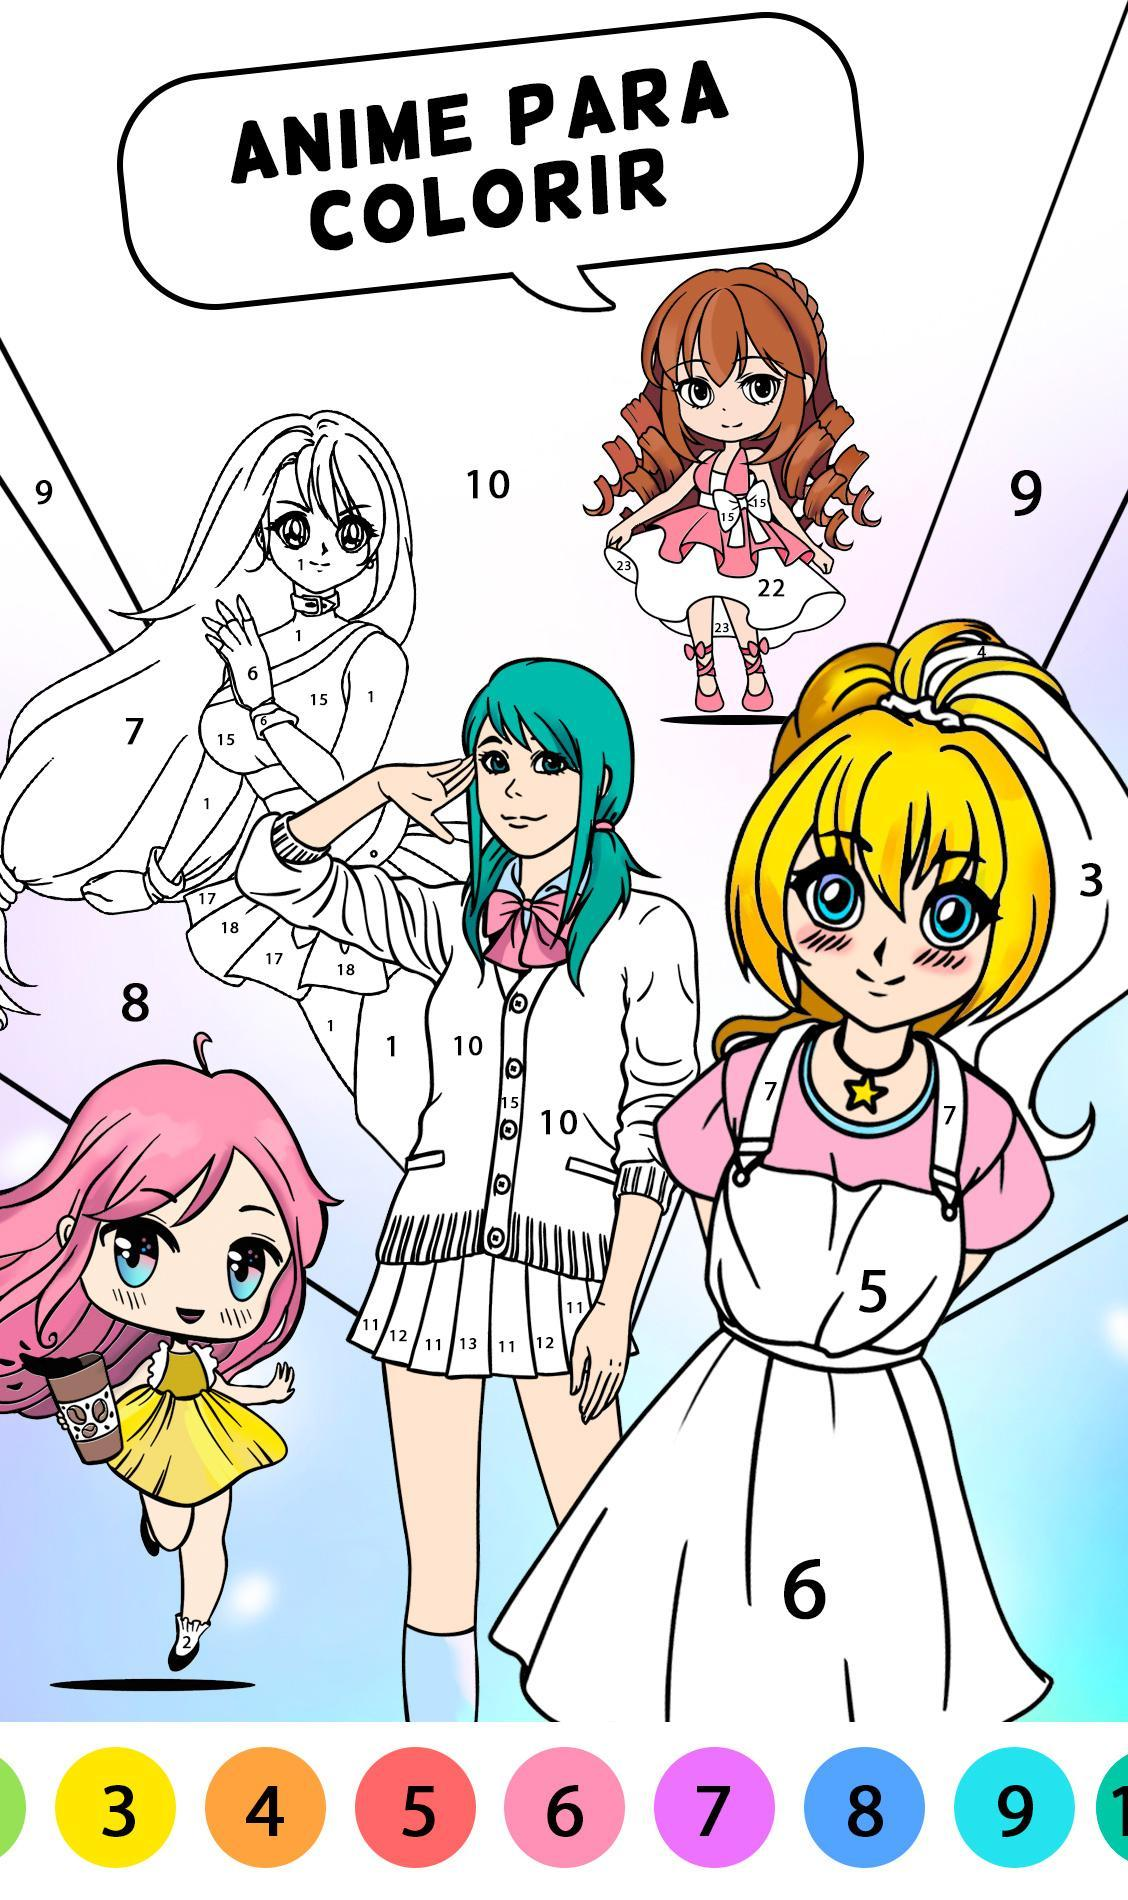 Anime Para Colorir Para Android Apk Baixar